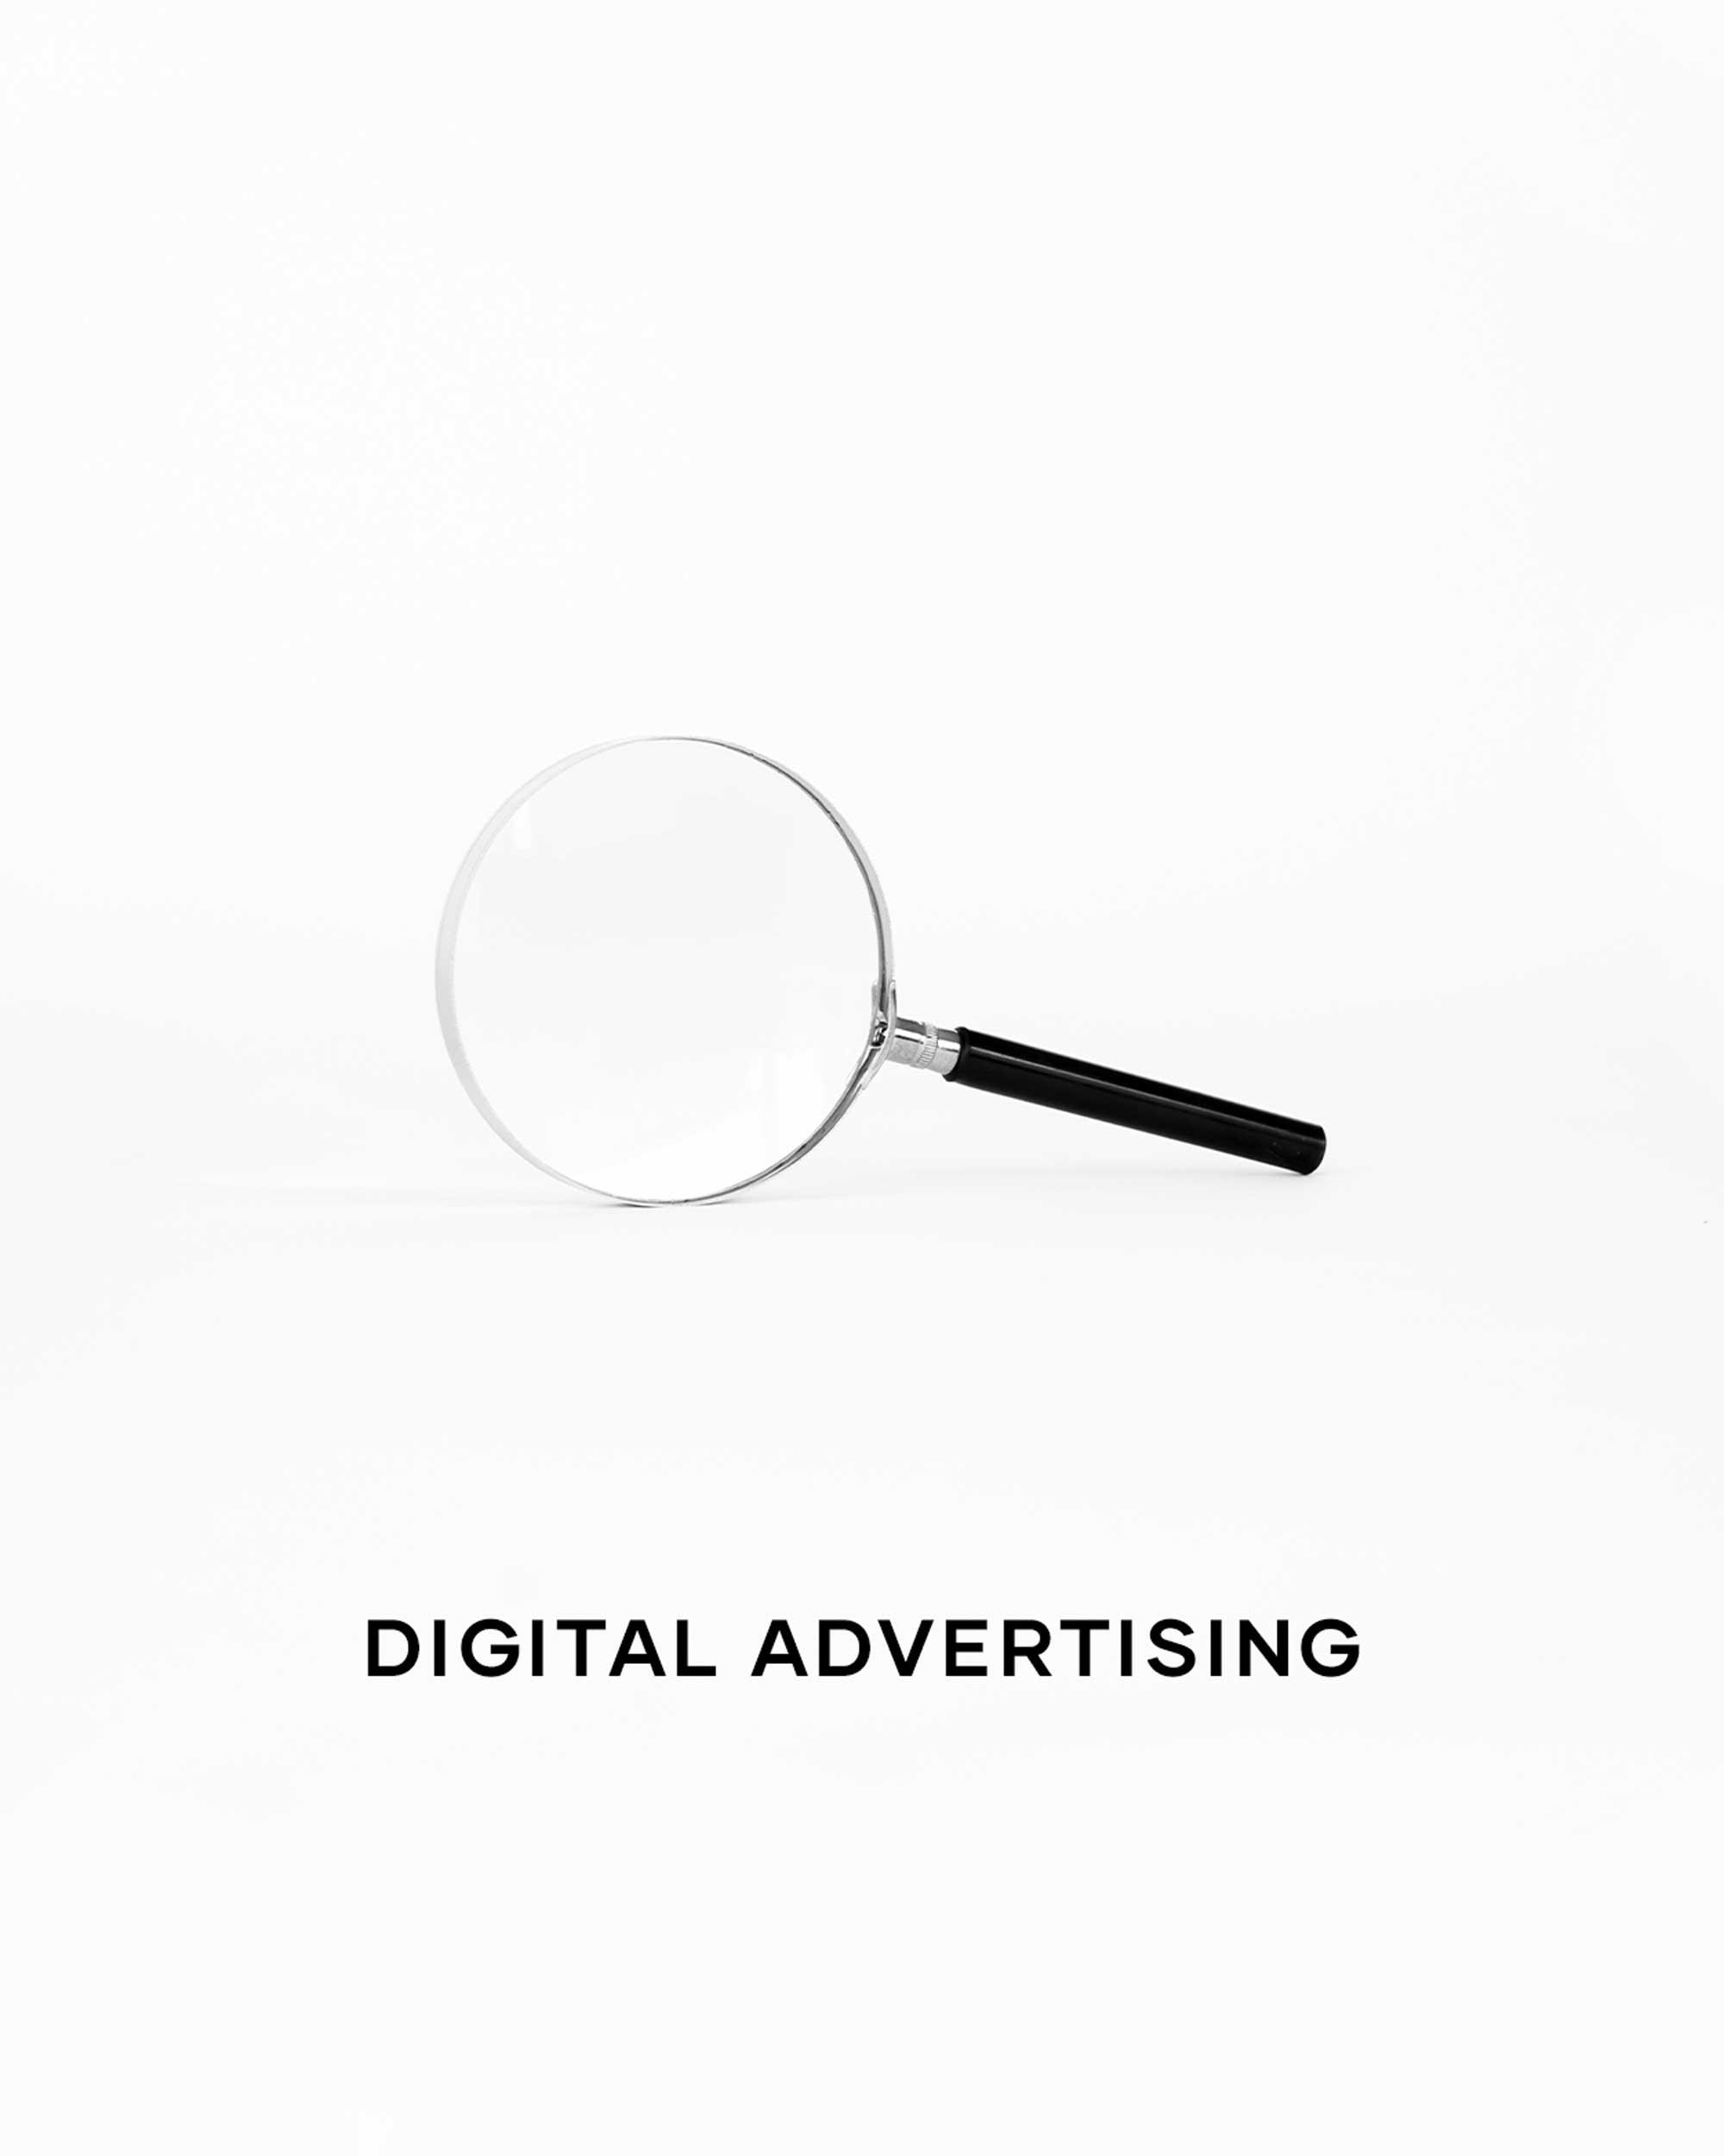 services-april-ford-digital-advertising.jpg